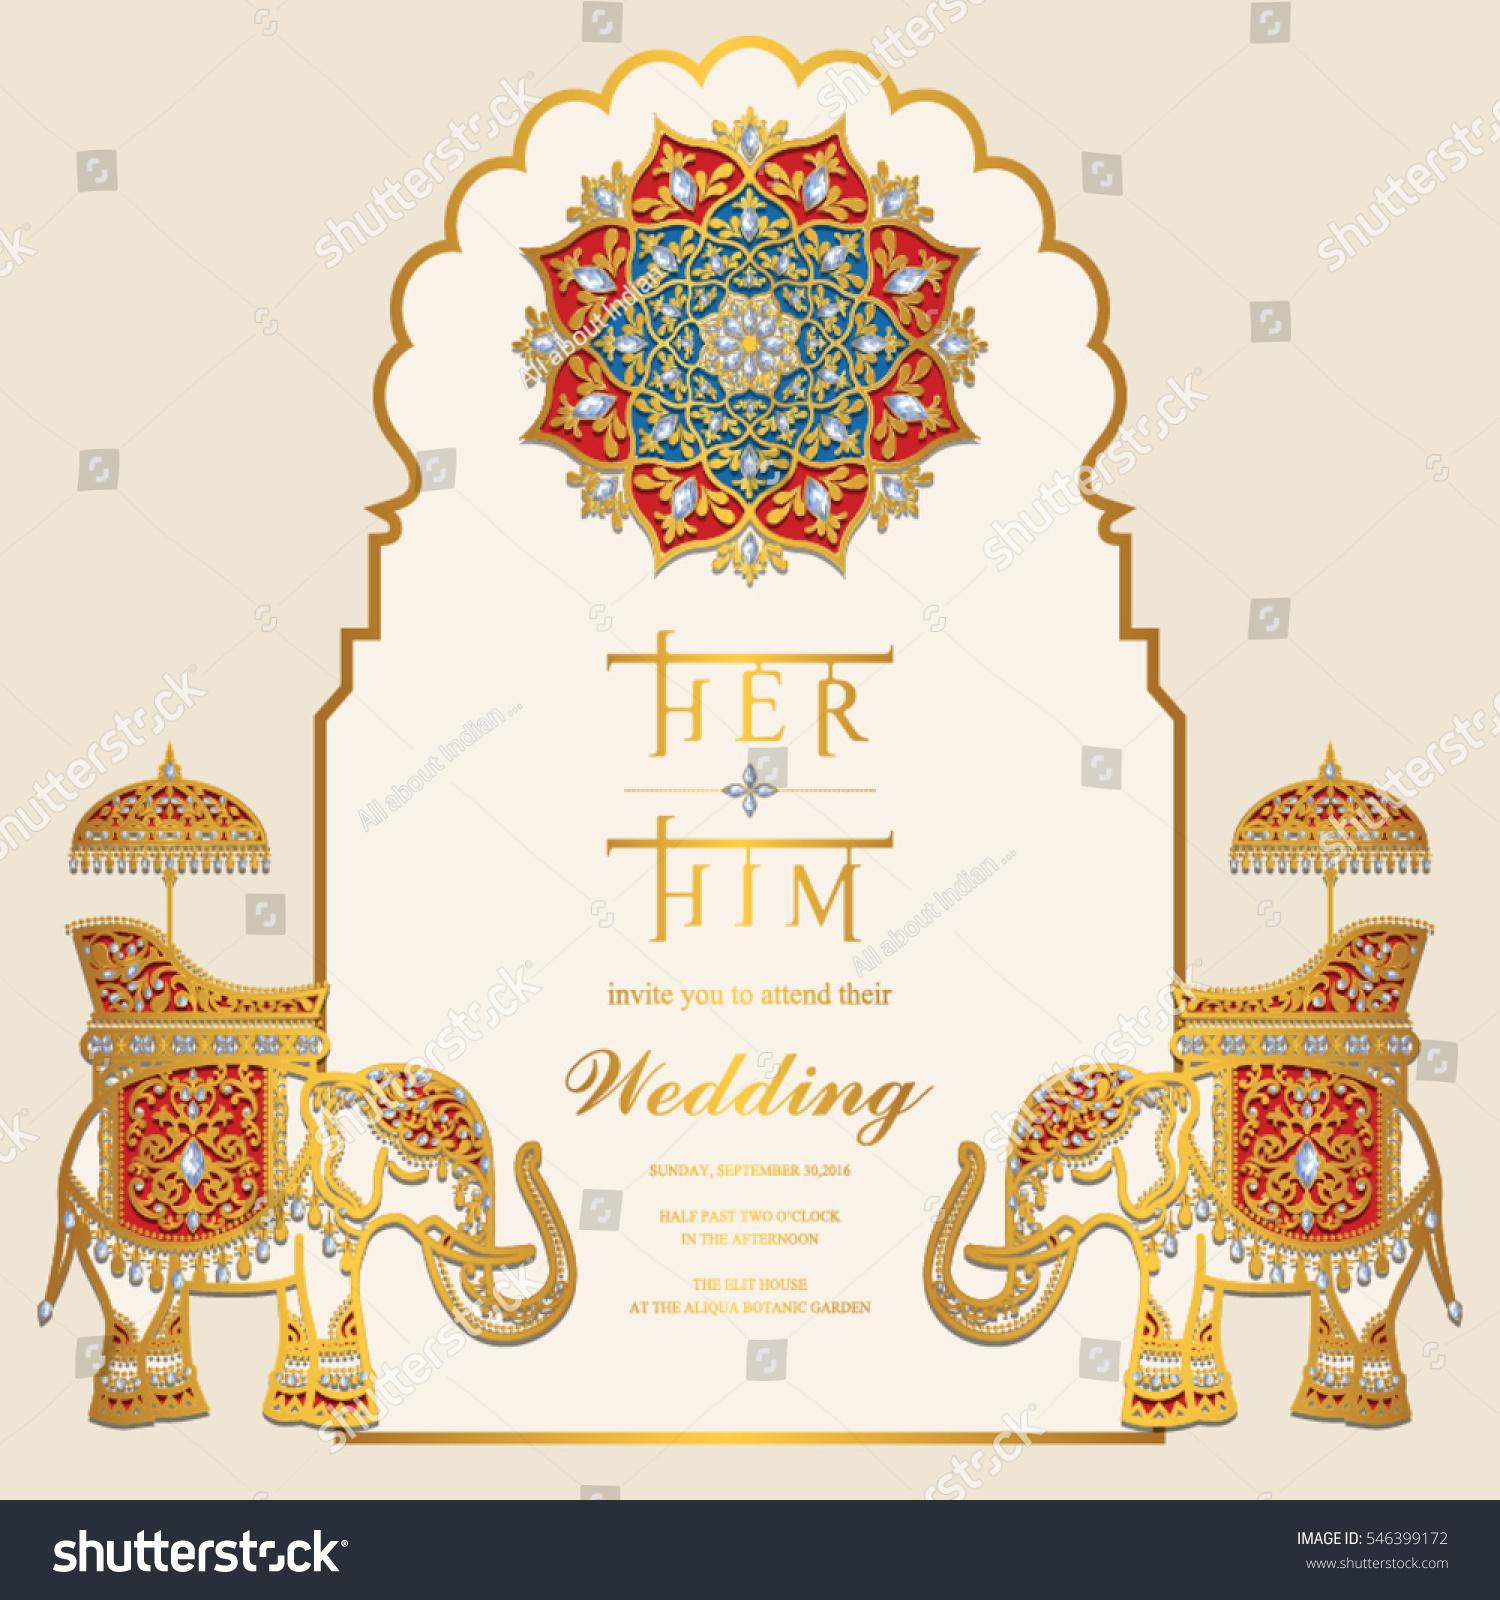 Indian Wedding Invitation Card Templates Gold Stock Vektorgrafik